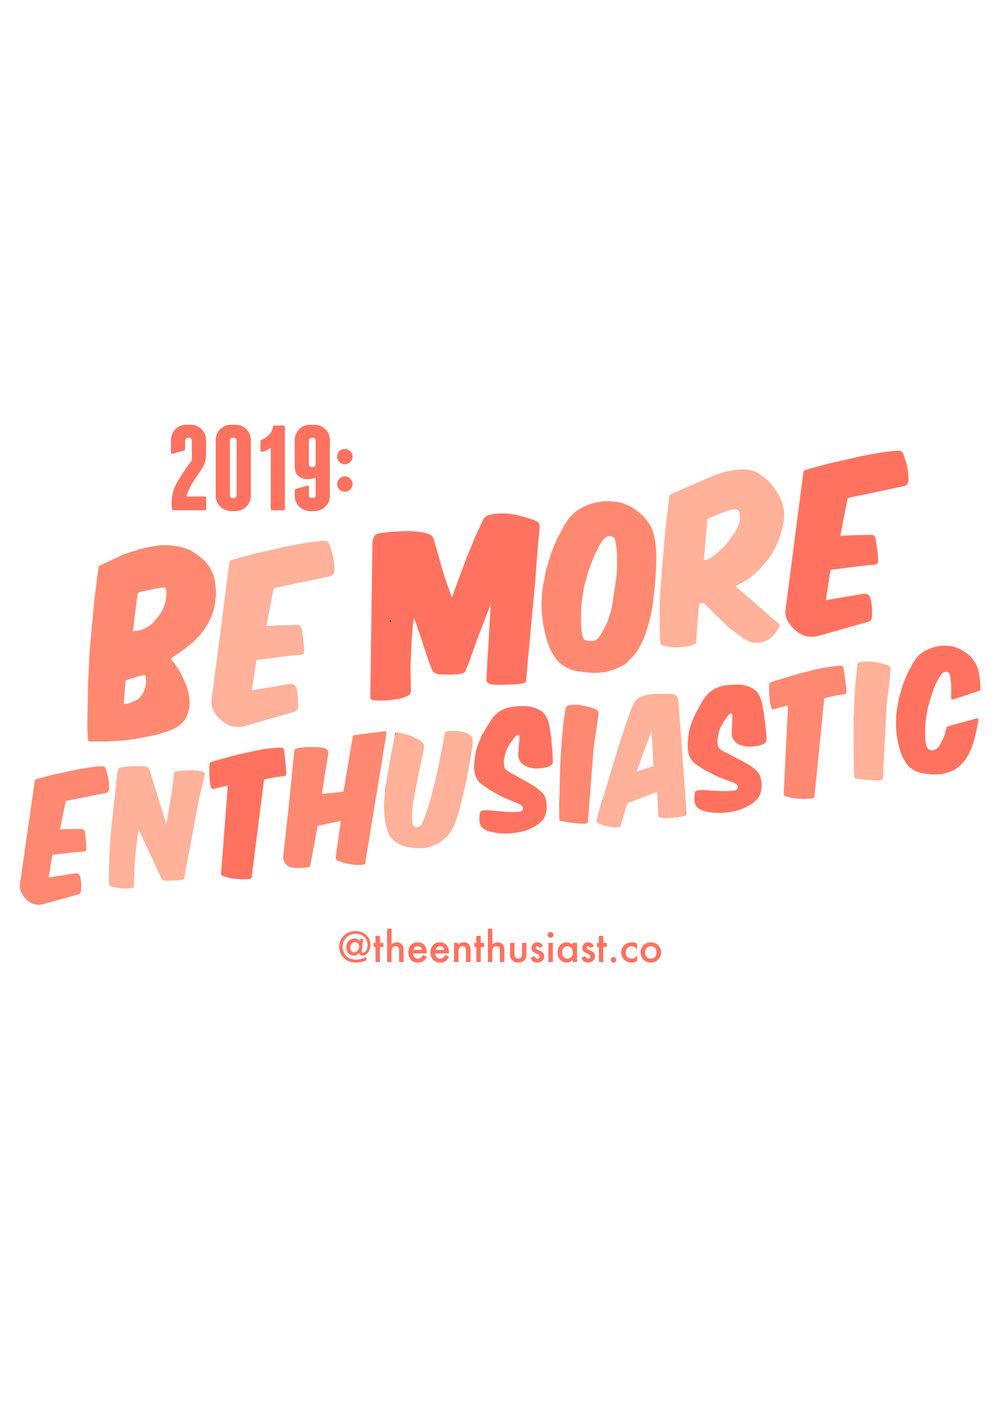 enthusiastic 2019.jpg